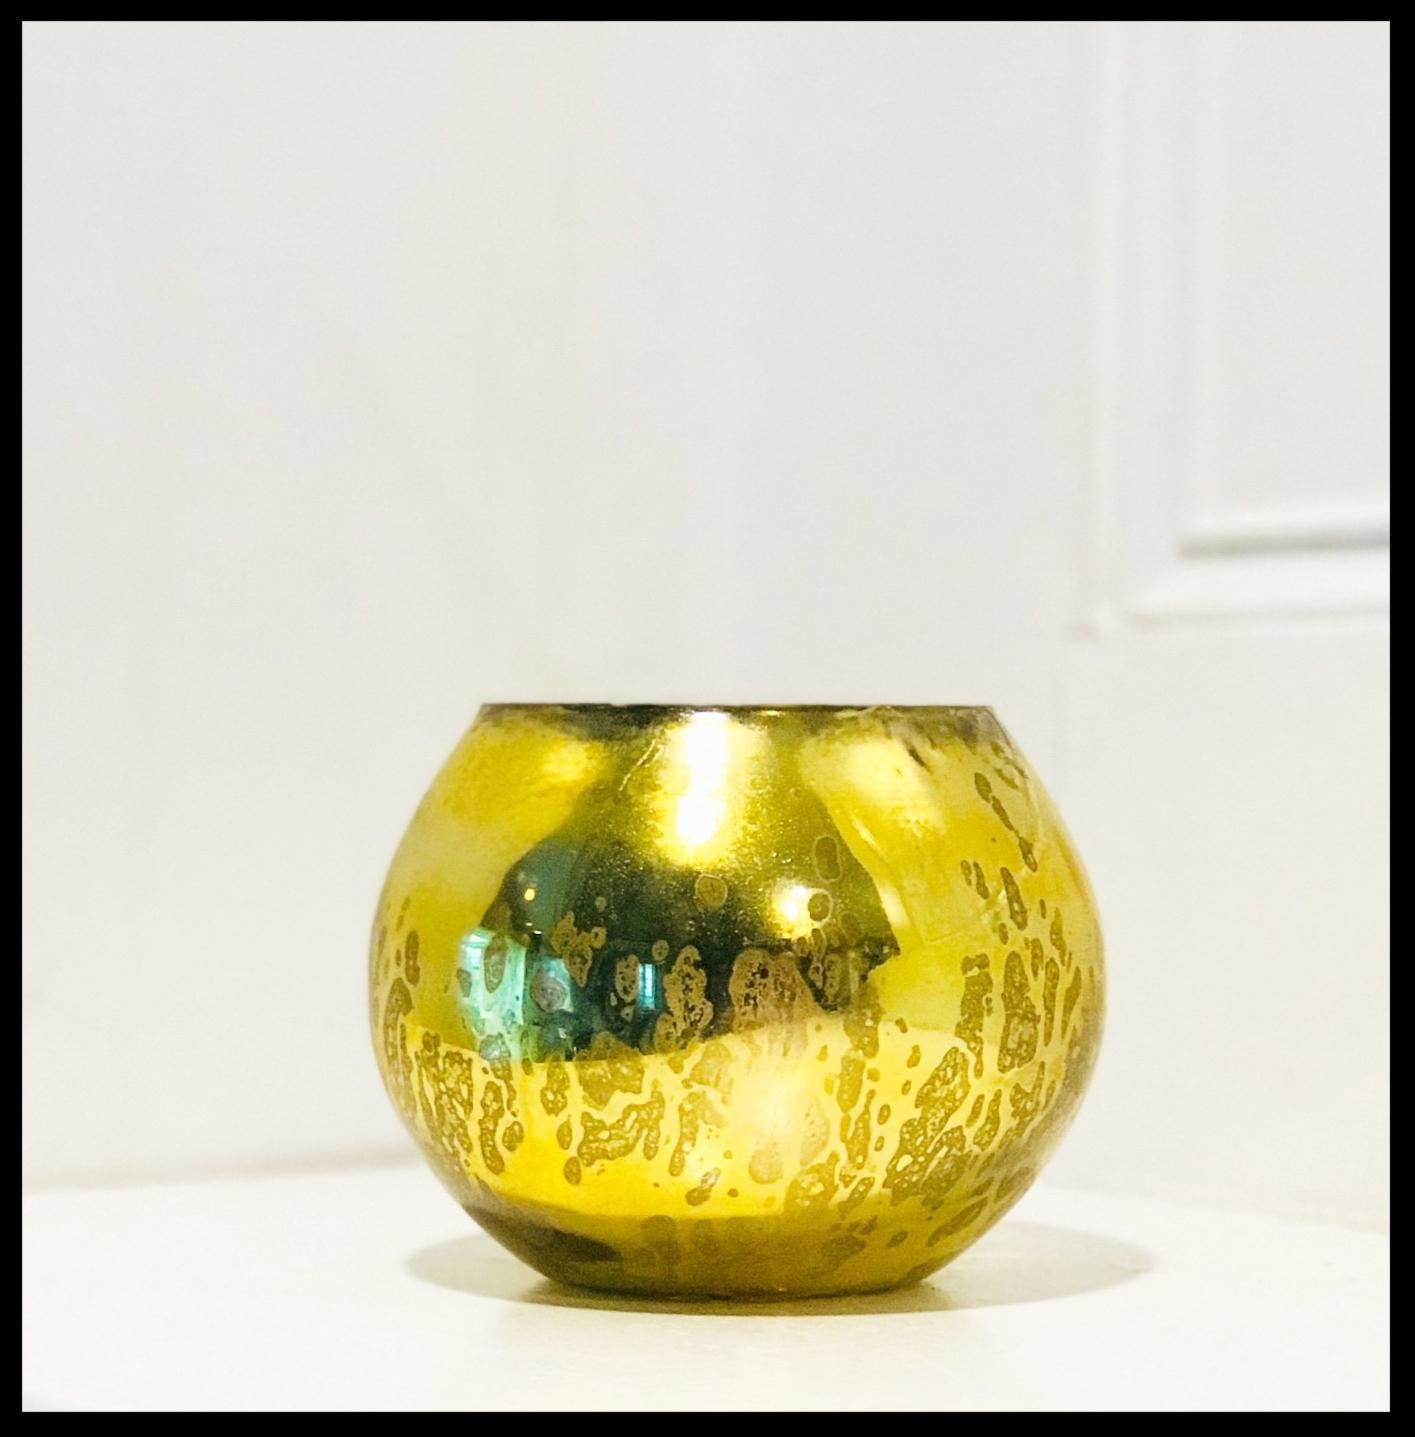 Vintage Gold Fish Bowl